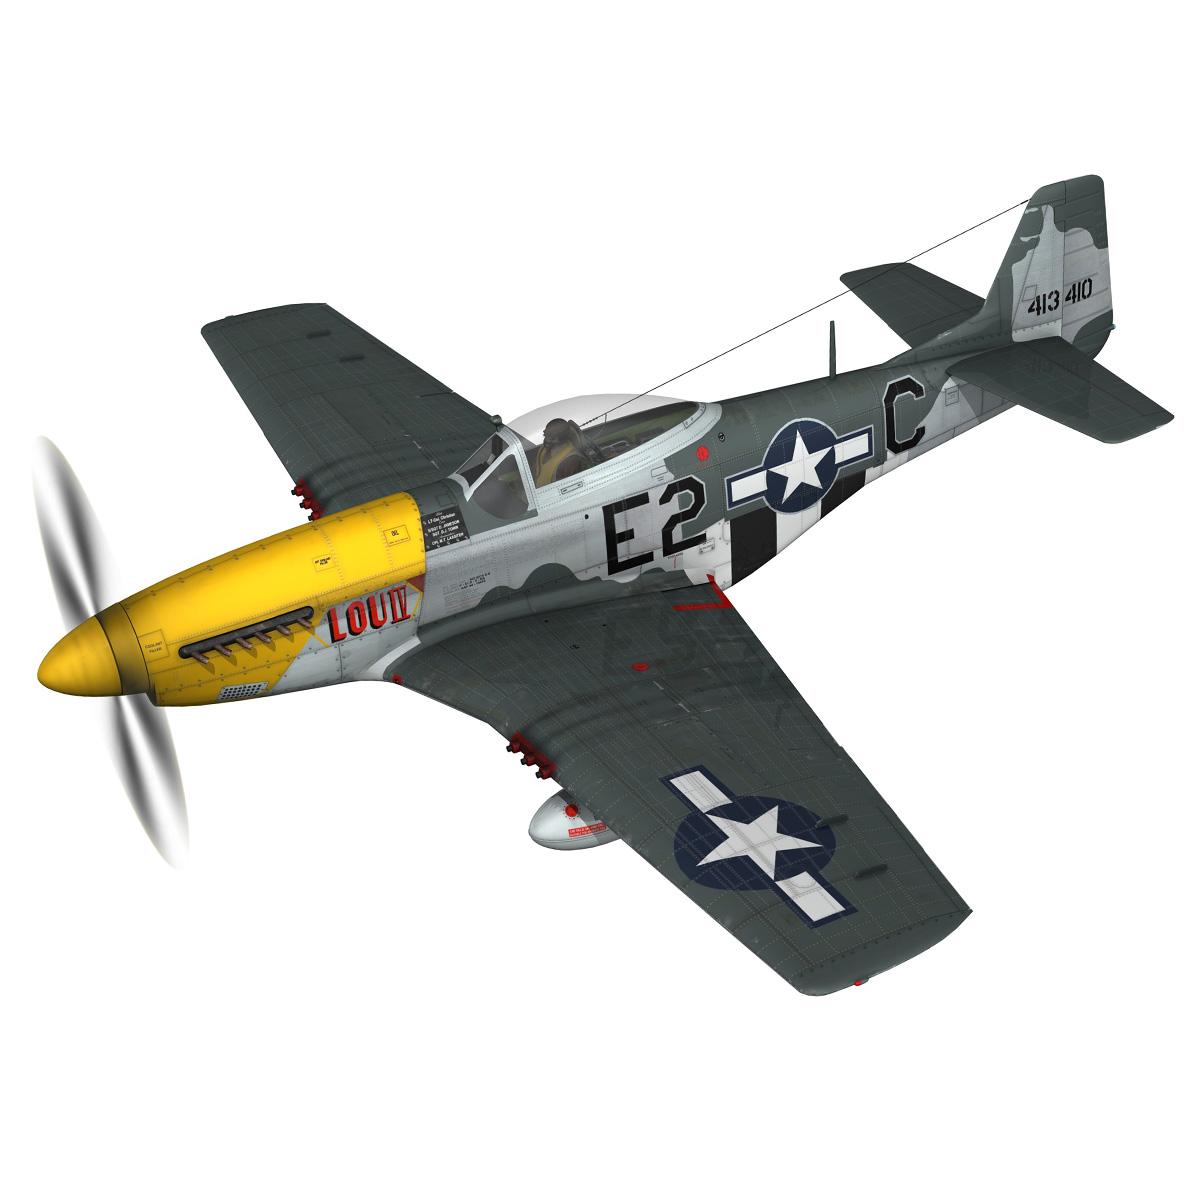 north american p-51d mustang – lou iv 3d model fbx c4d lwo obj 272600